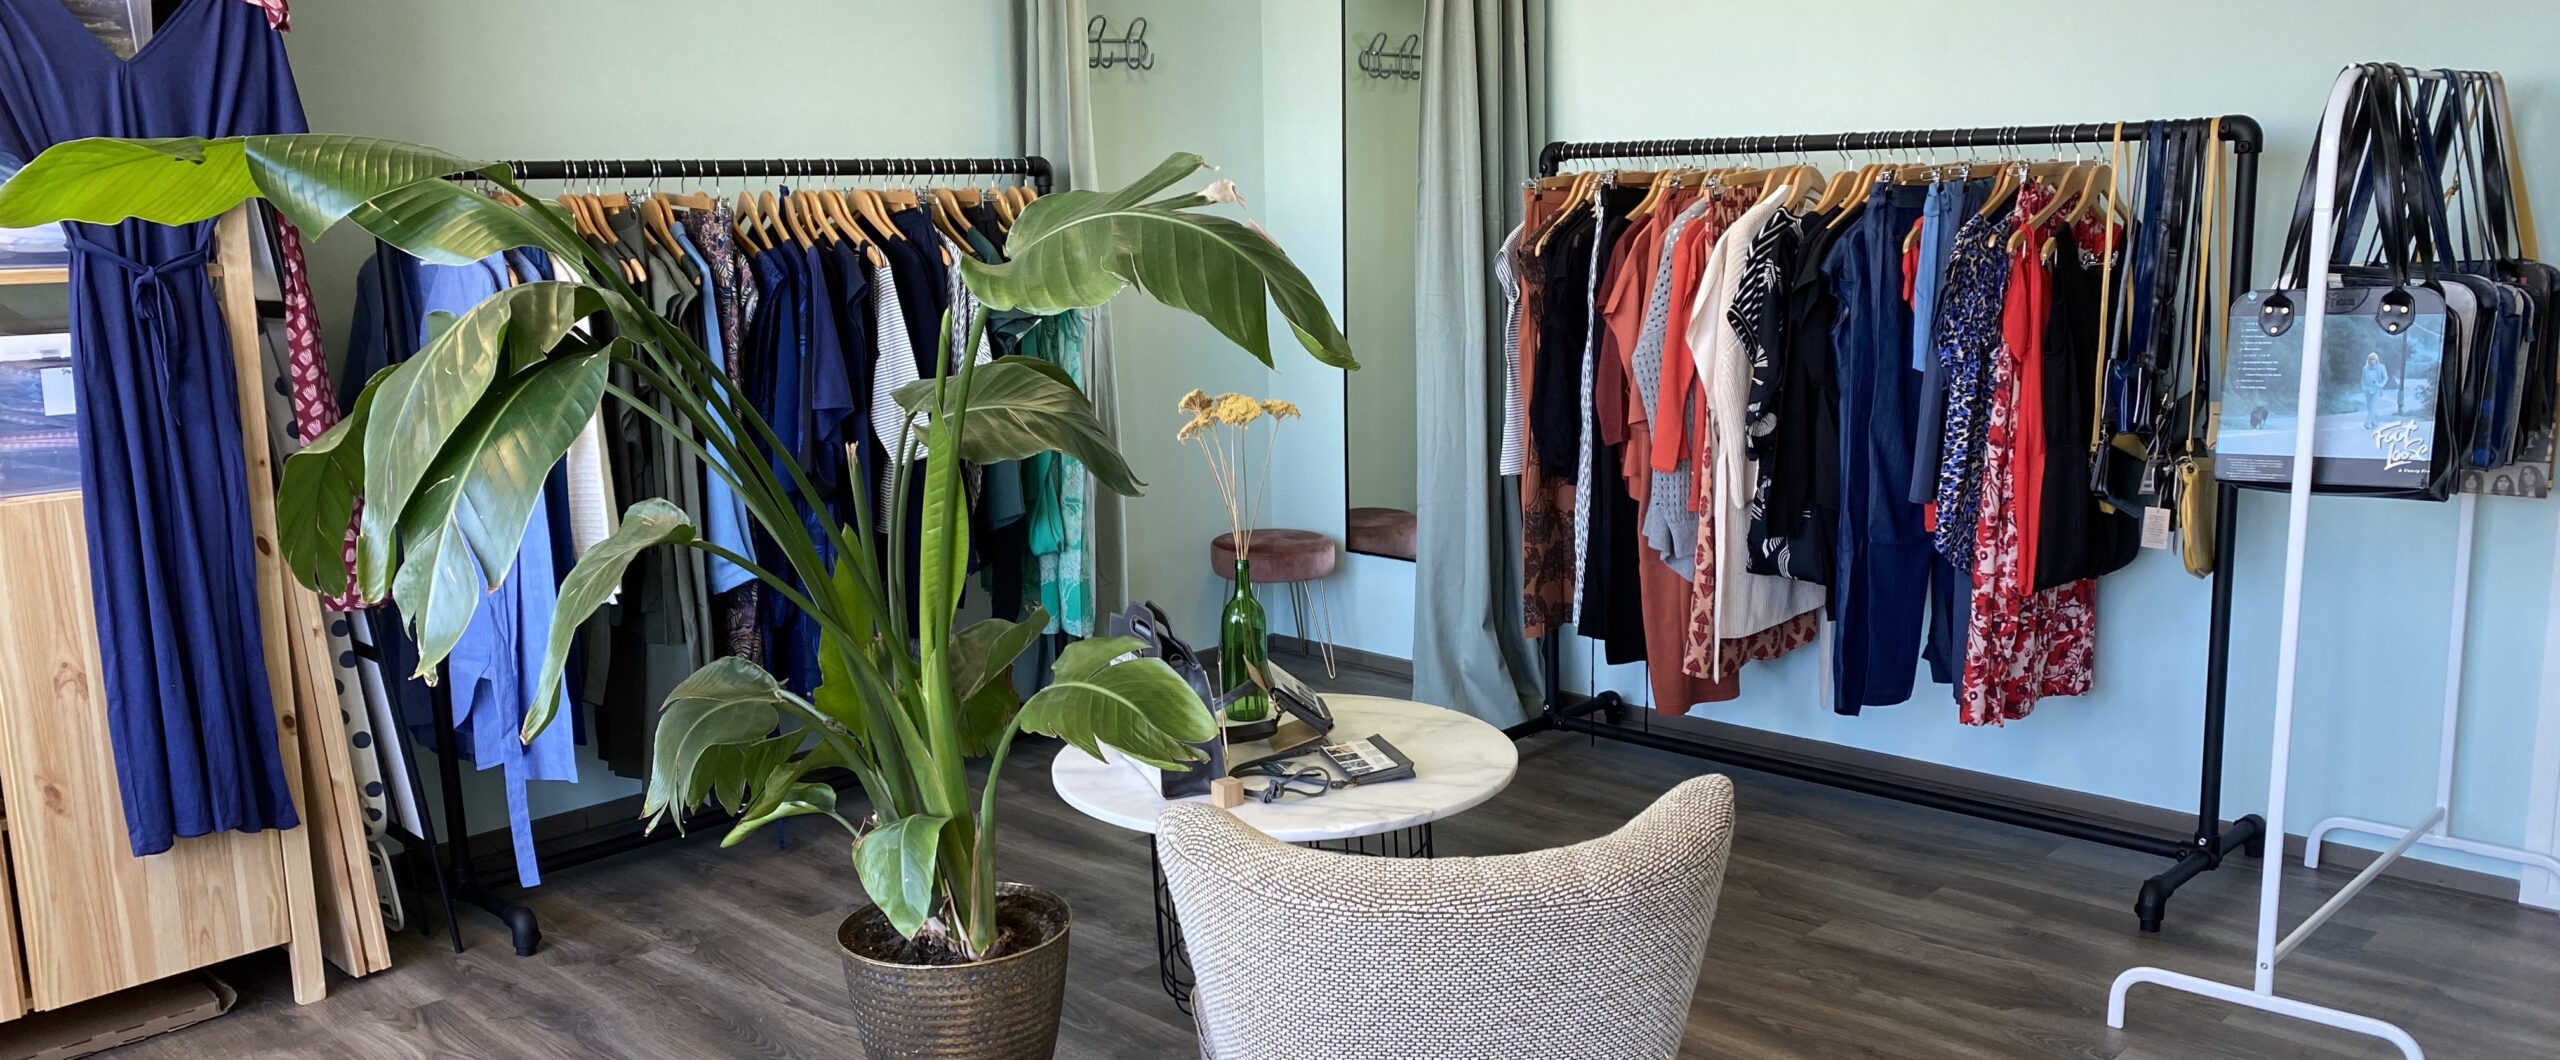 Duurzame kledingwinkel showroom Utrecht